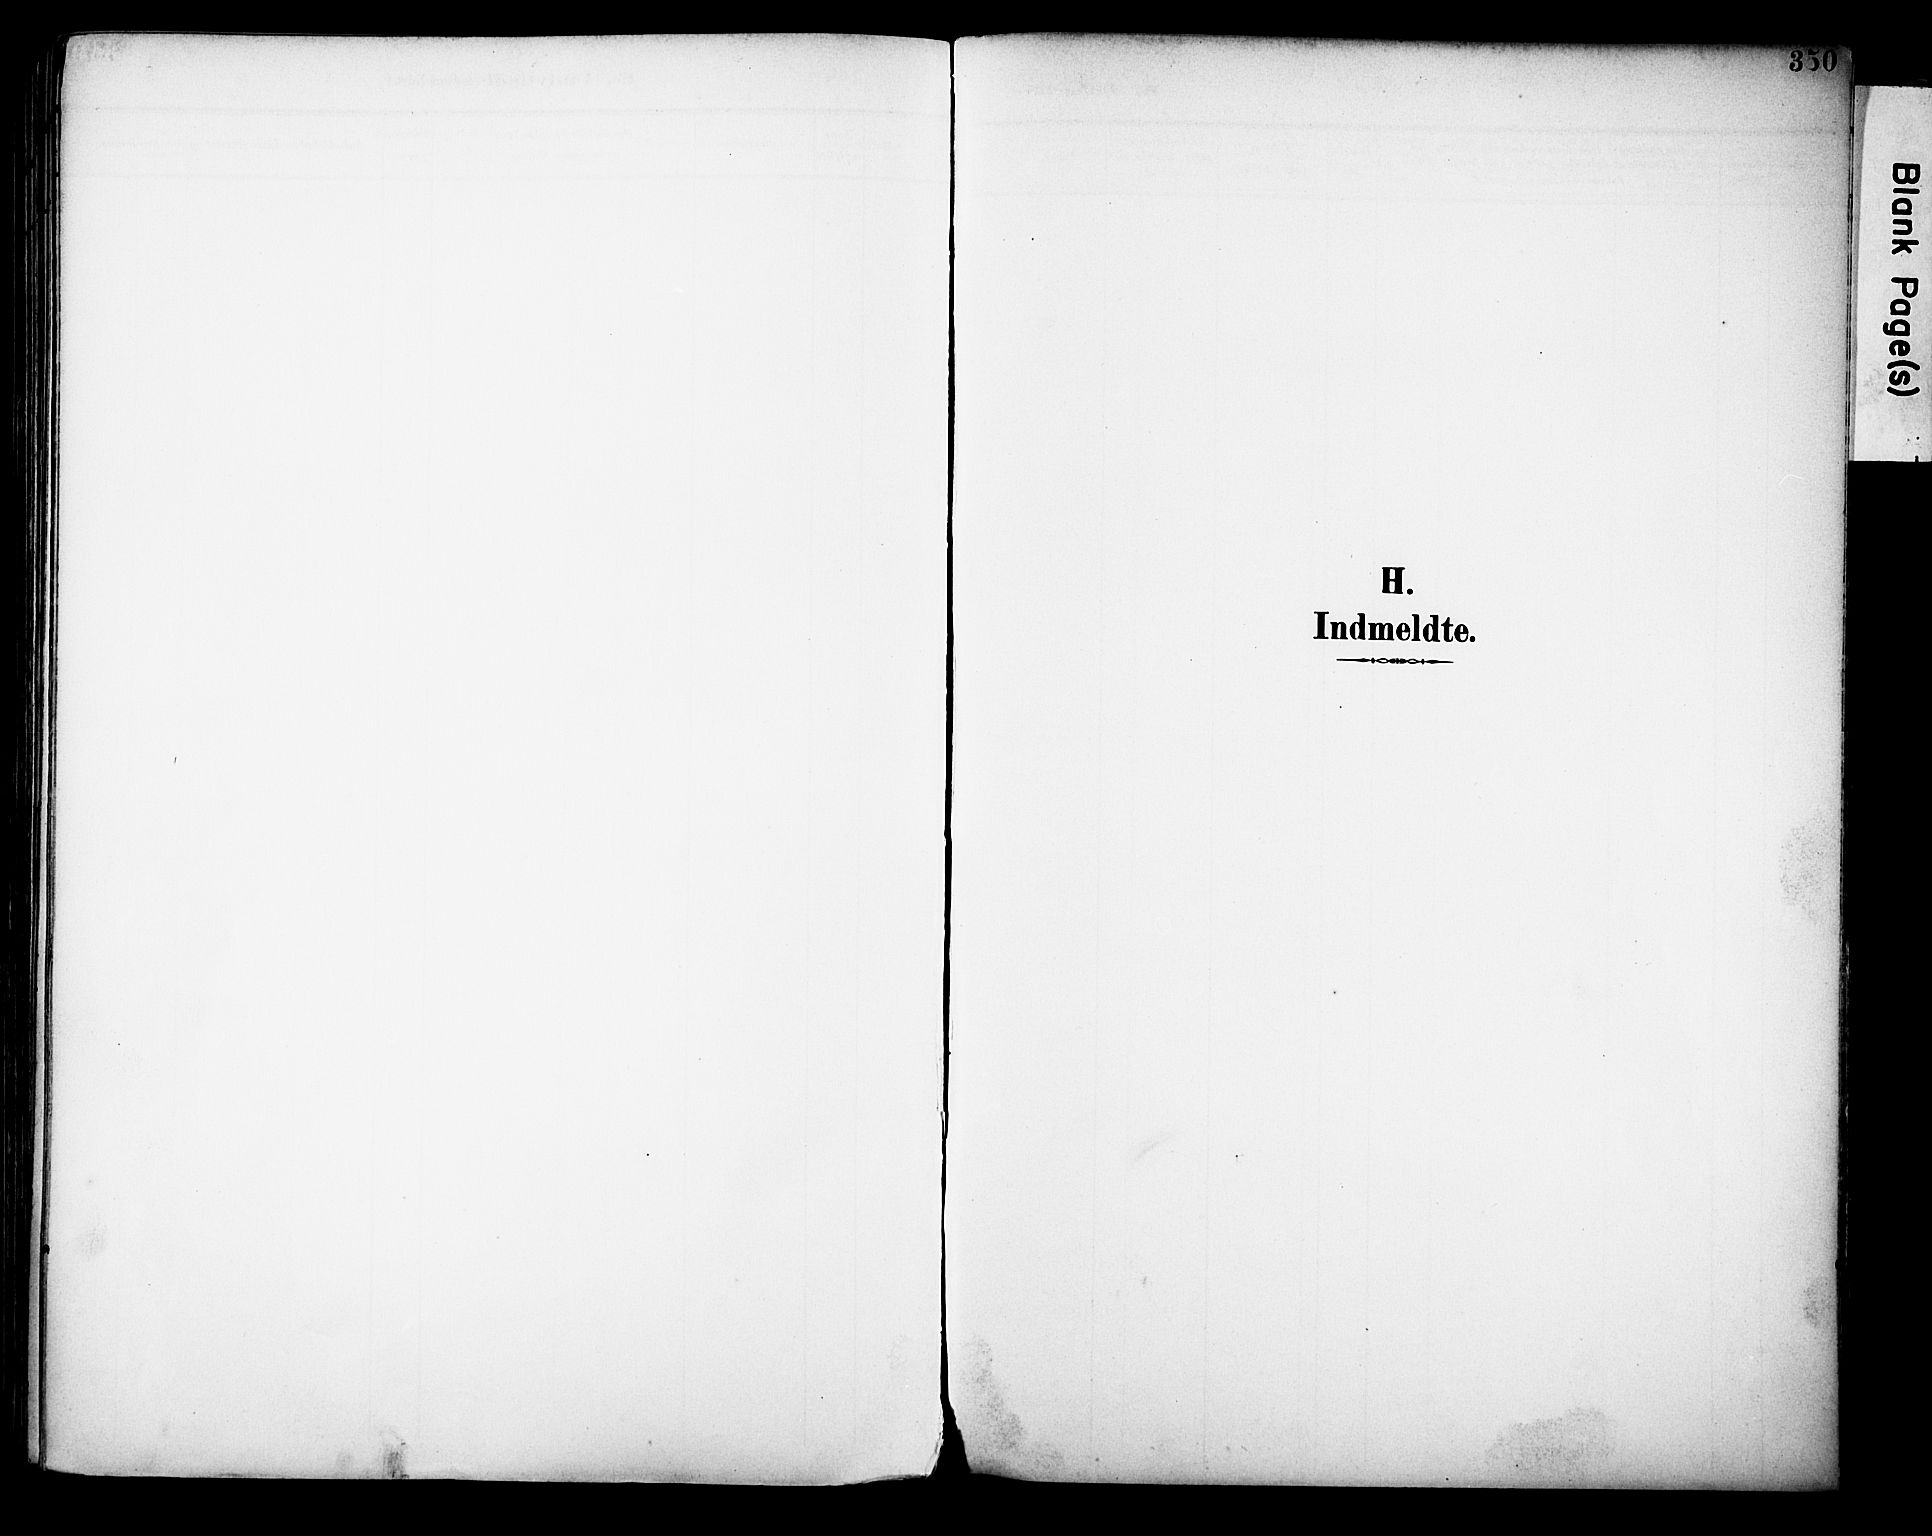 SAH, Vestre Toten prestekontor, H/Ha/Haa/L0013: Ministerialbok nr. 13, 1895-1911, s. 350